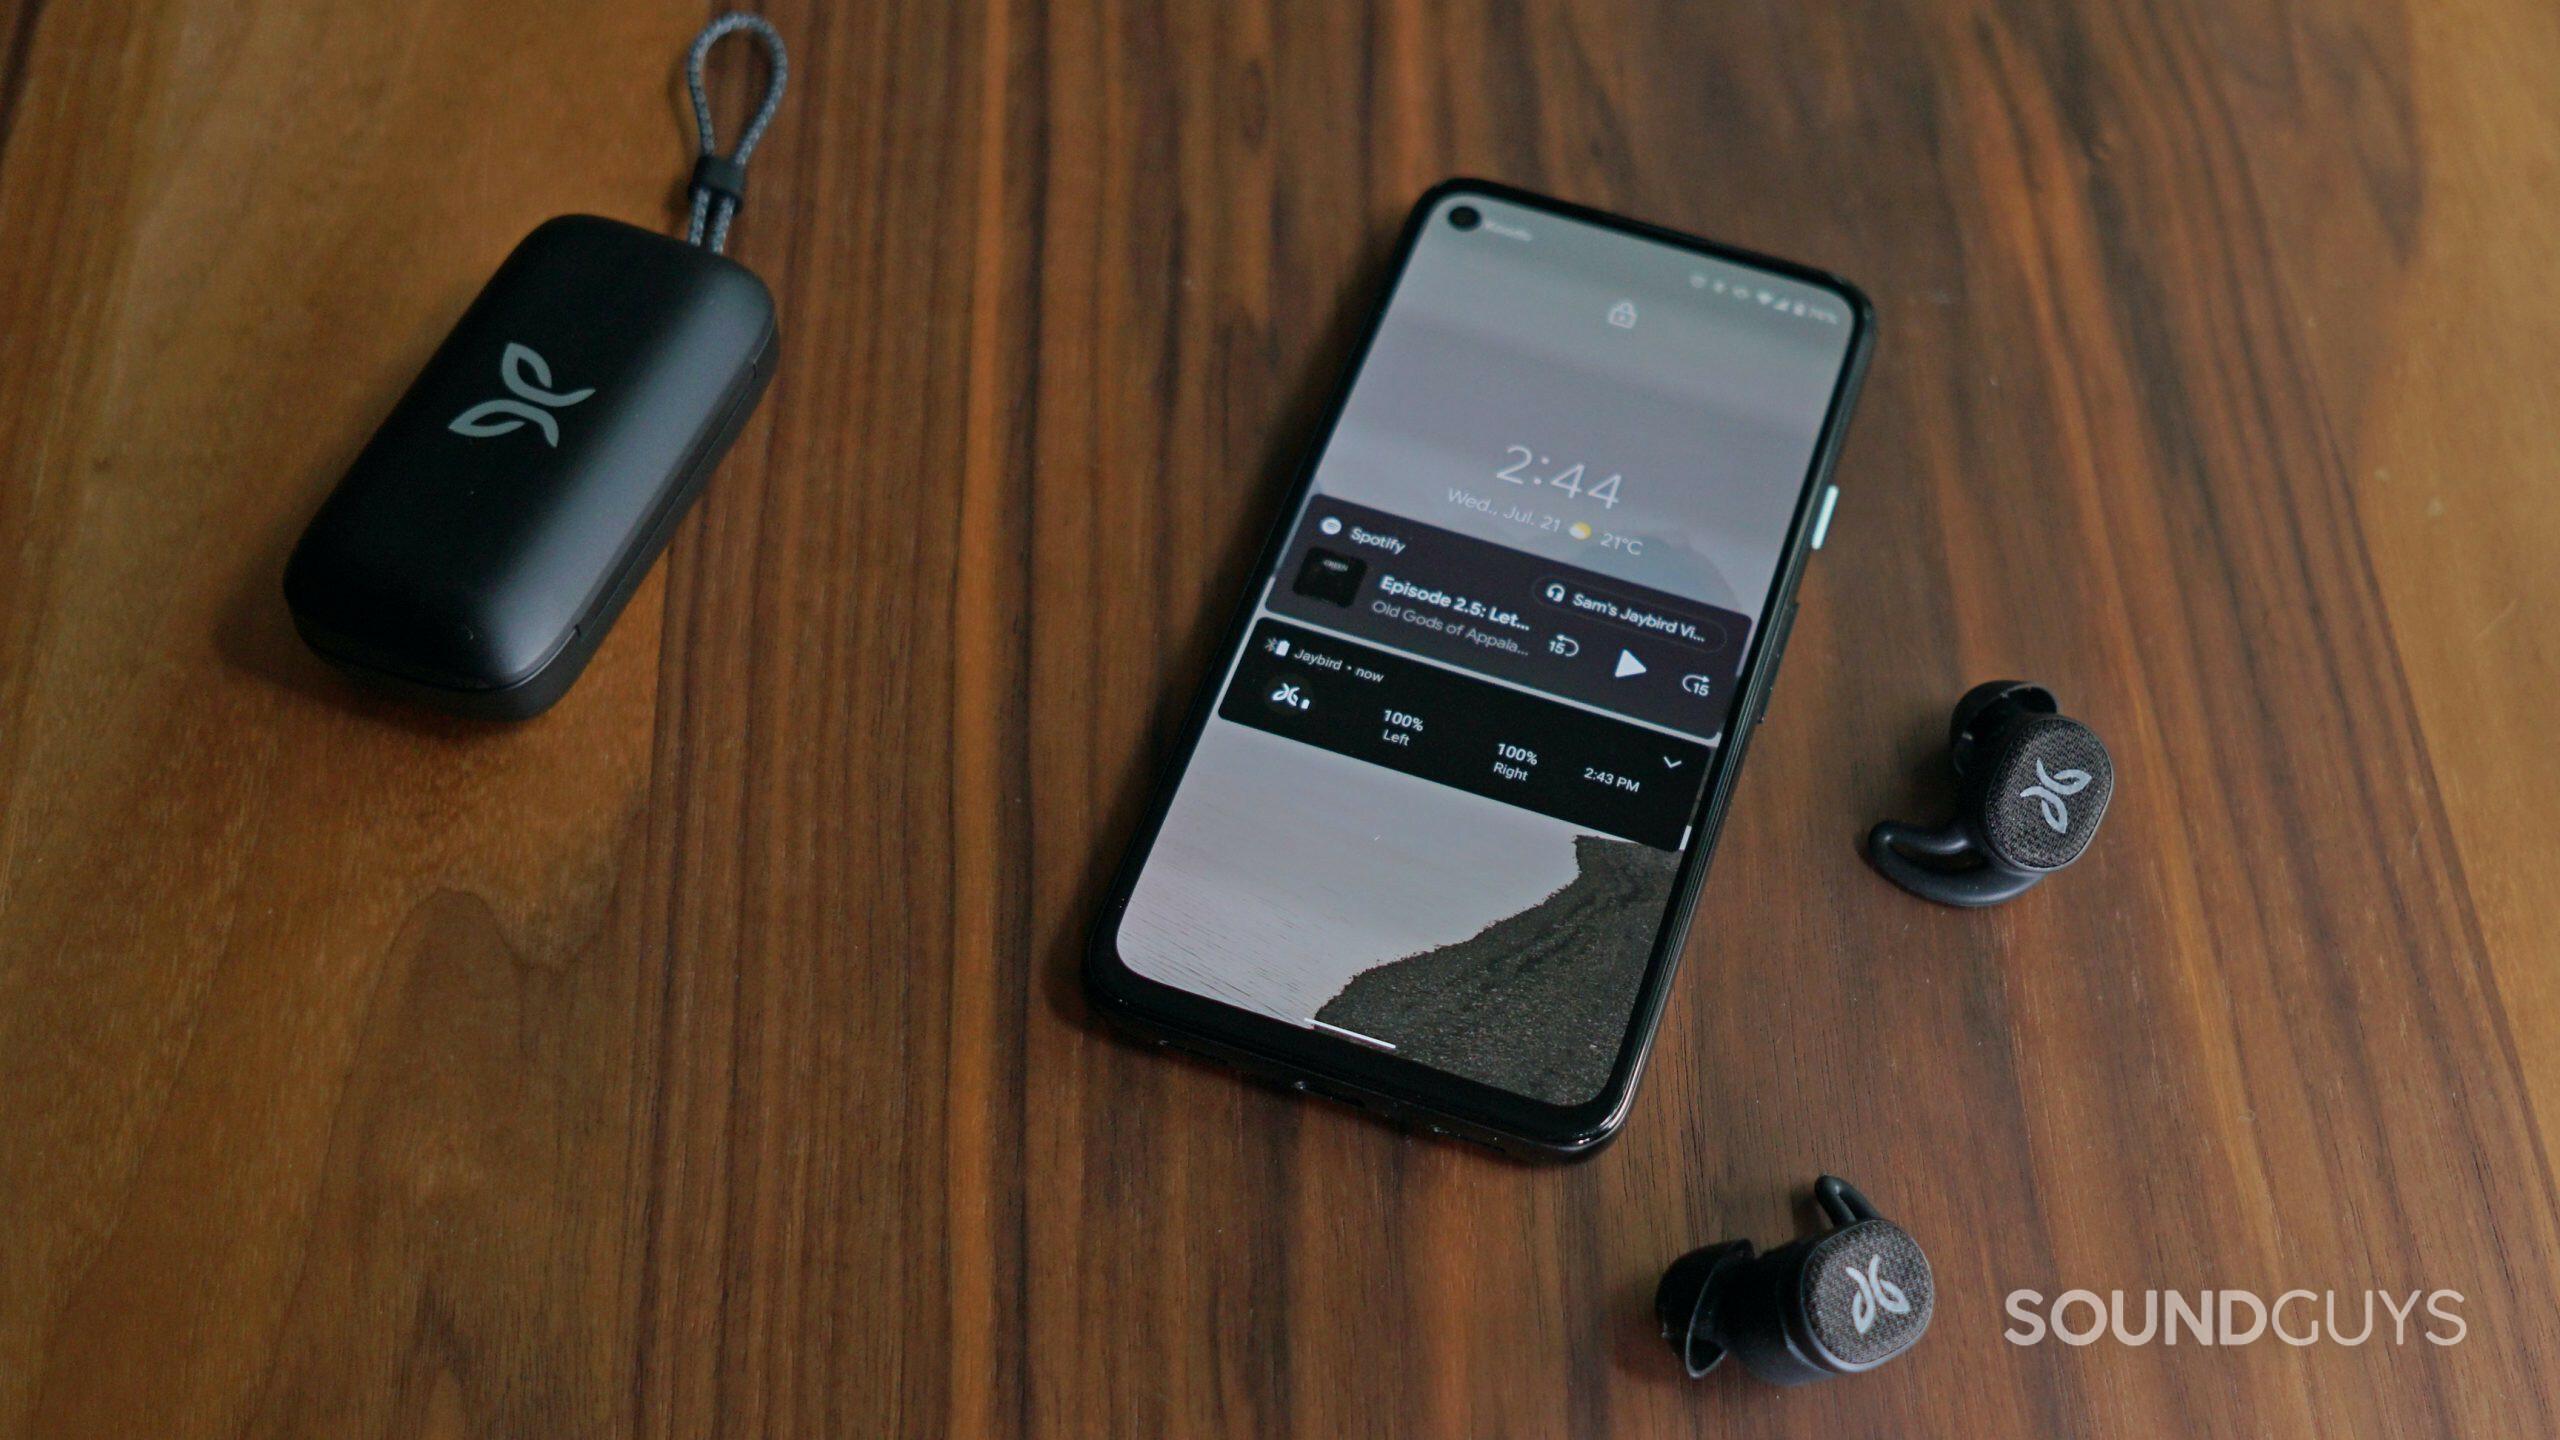 Jaybird Vista 2 earbuds and case next to smartphone.